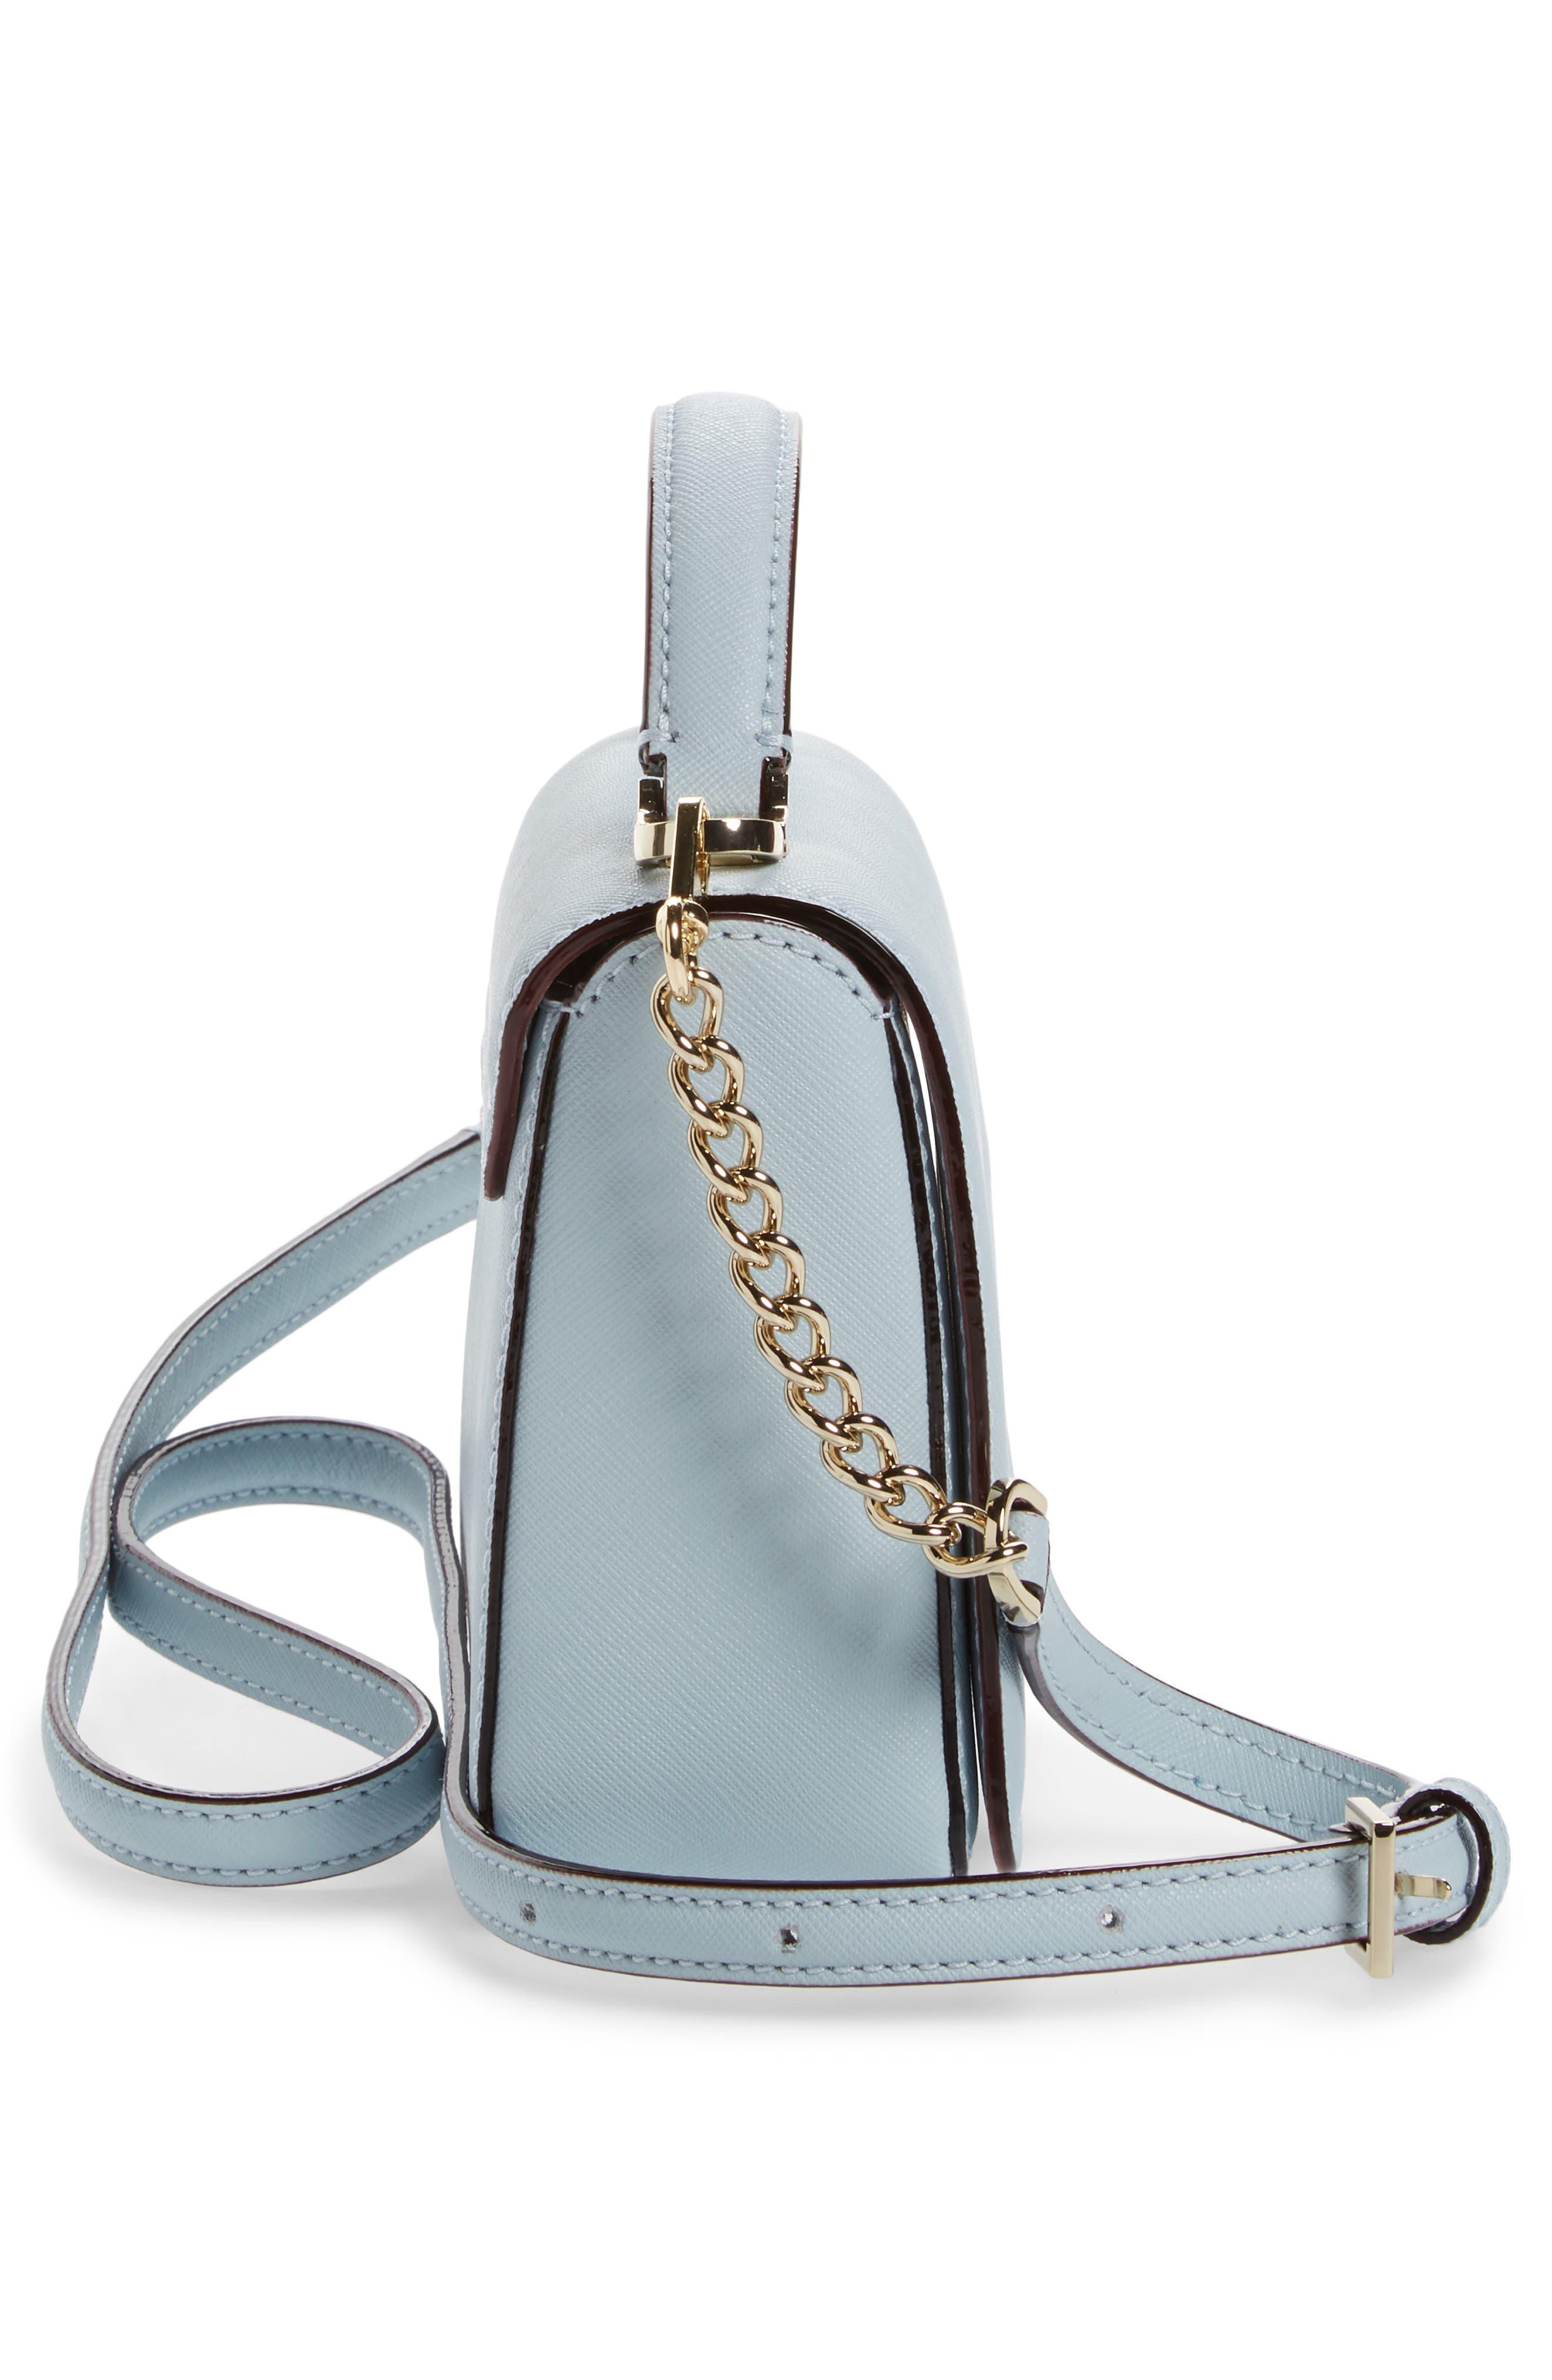 cameron street - hope saffiano leather crossbody bag,                             Alternate thumbnail 14, color,